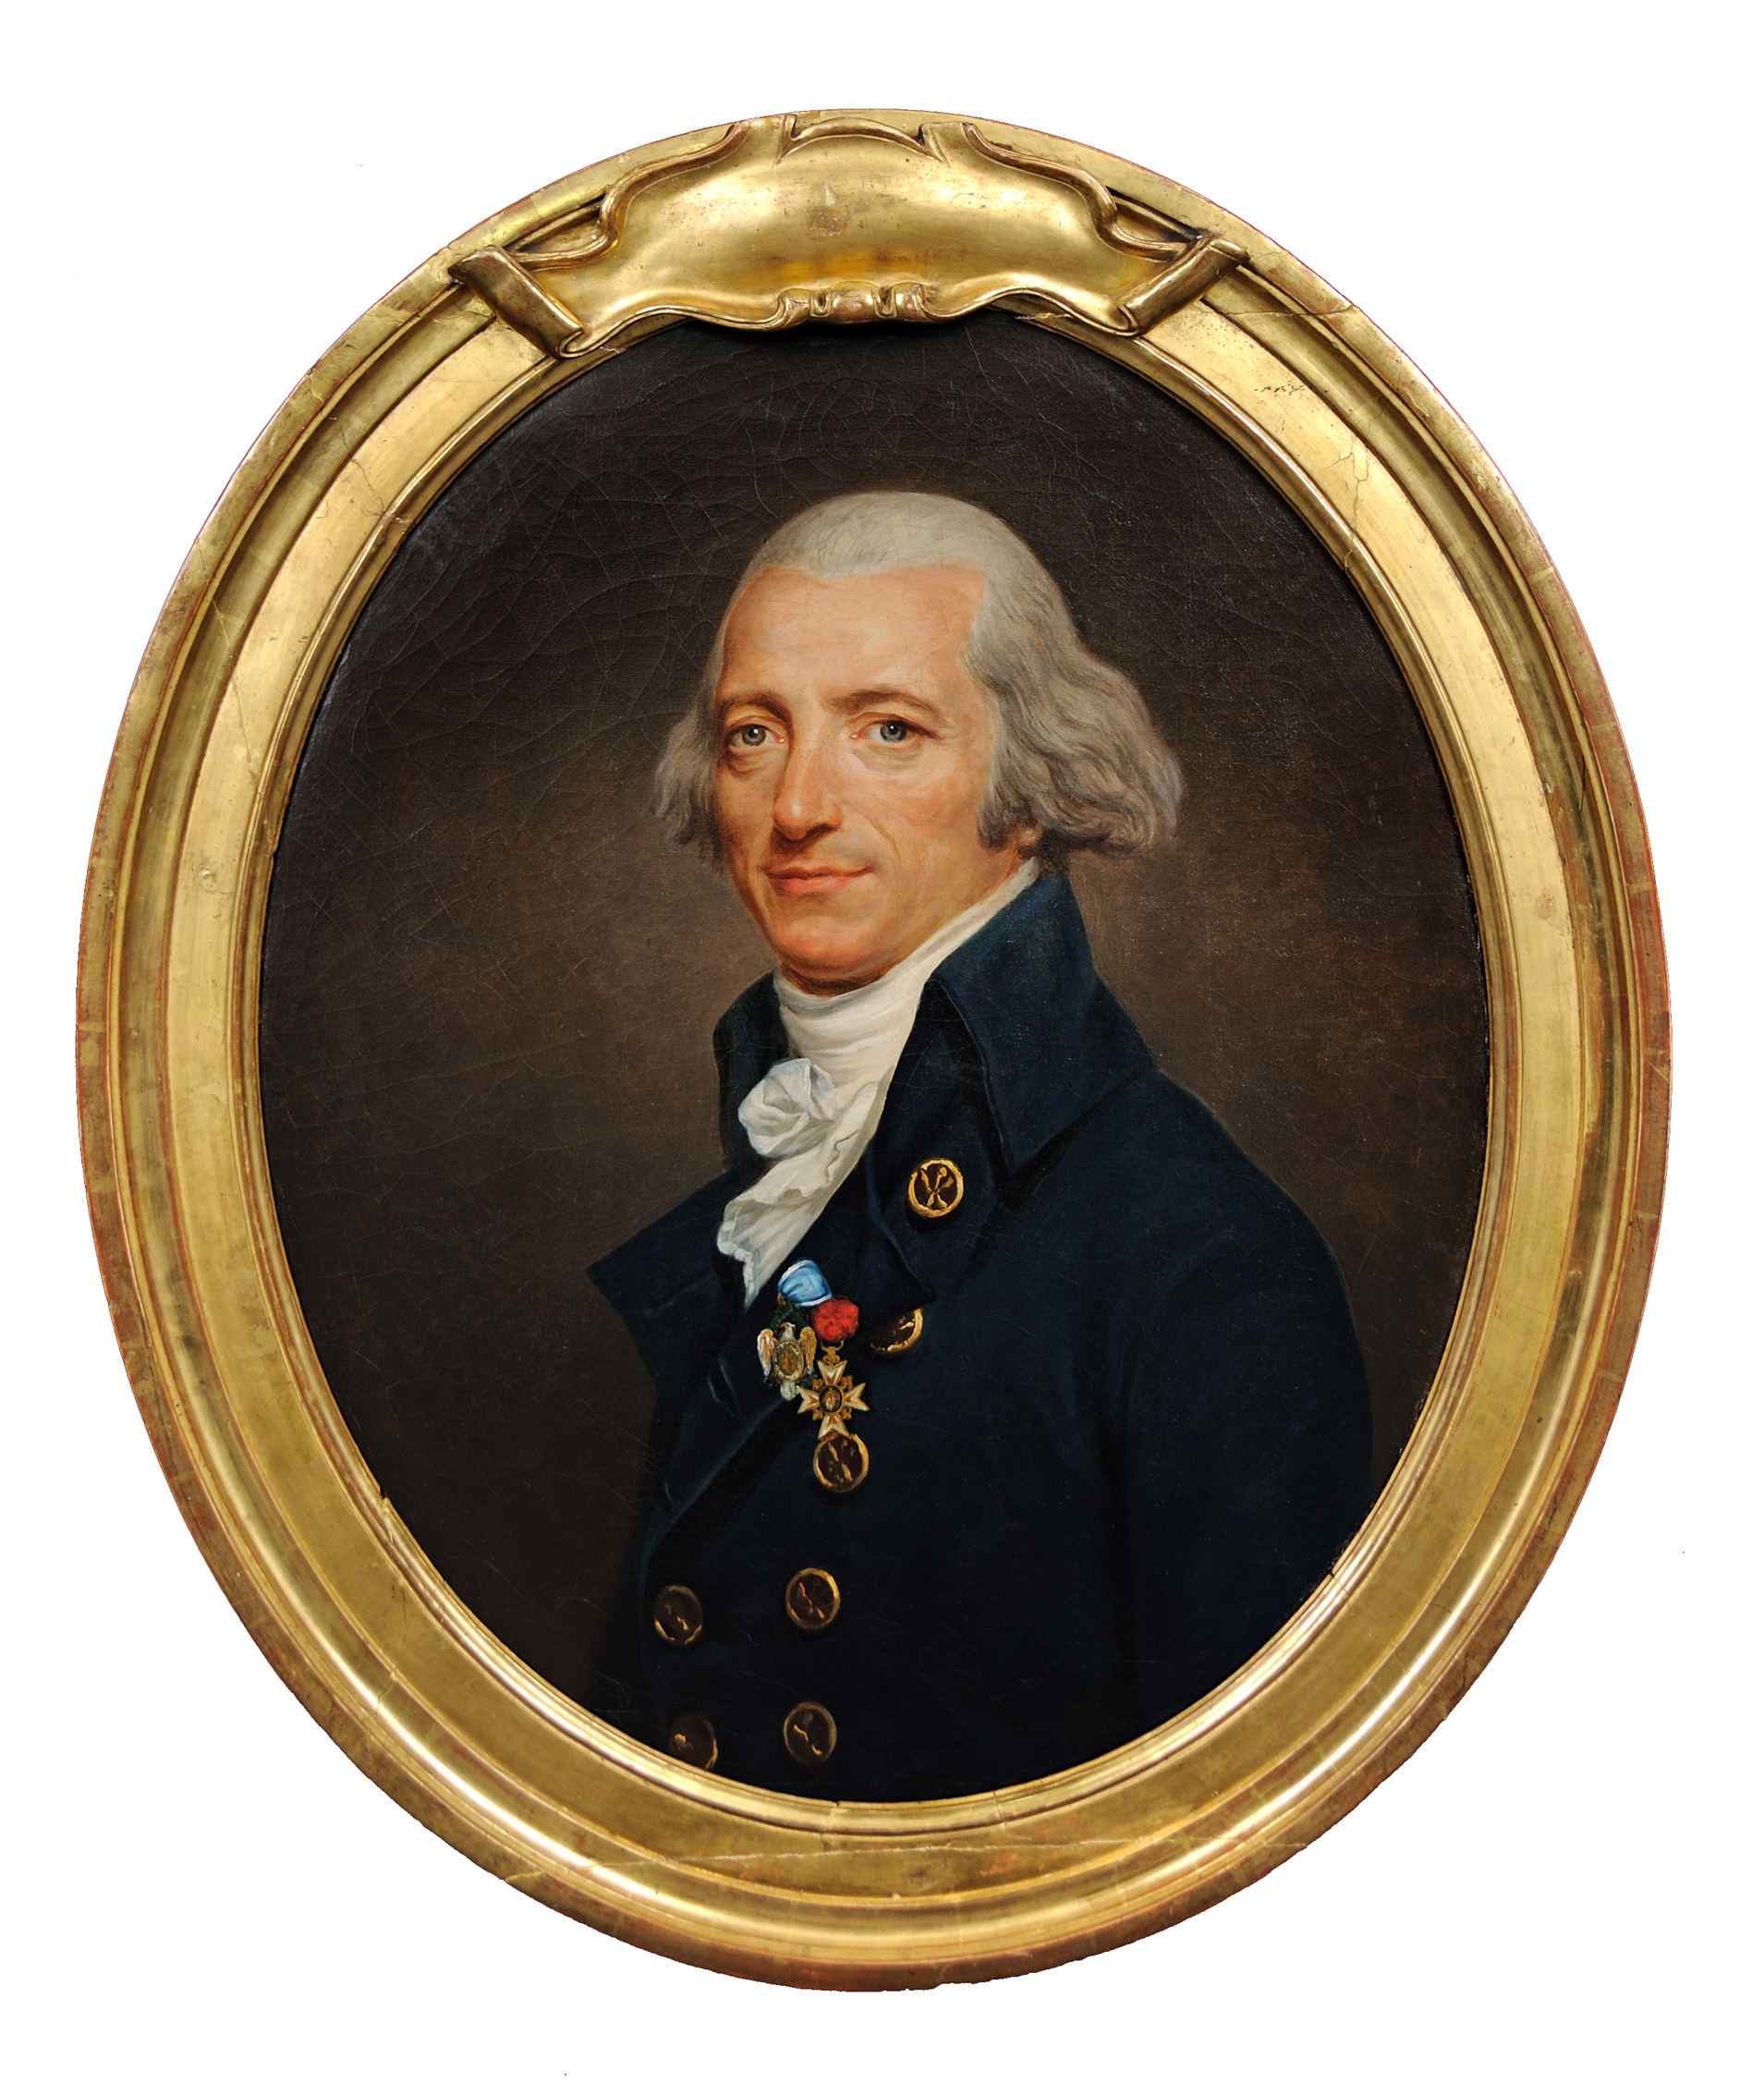 Gaultier de Murnan attributed to Joseph Boze ca. 1791-1796, framed